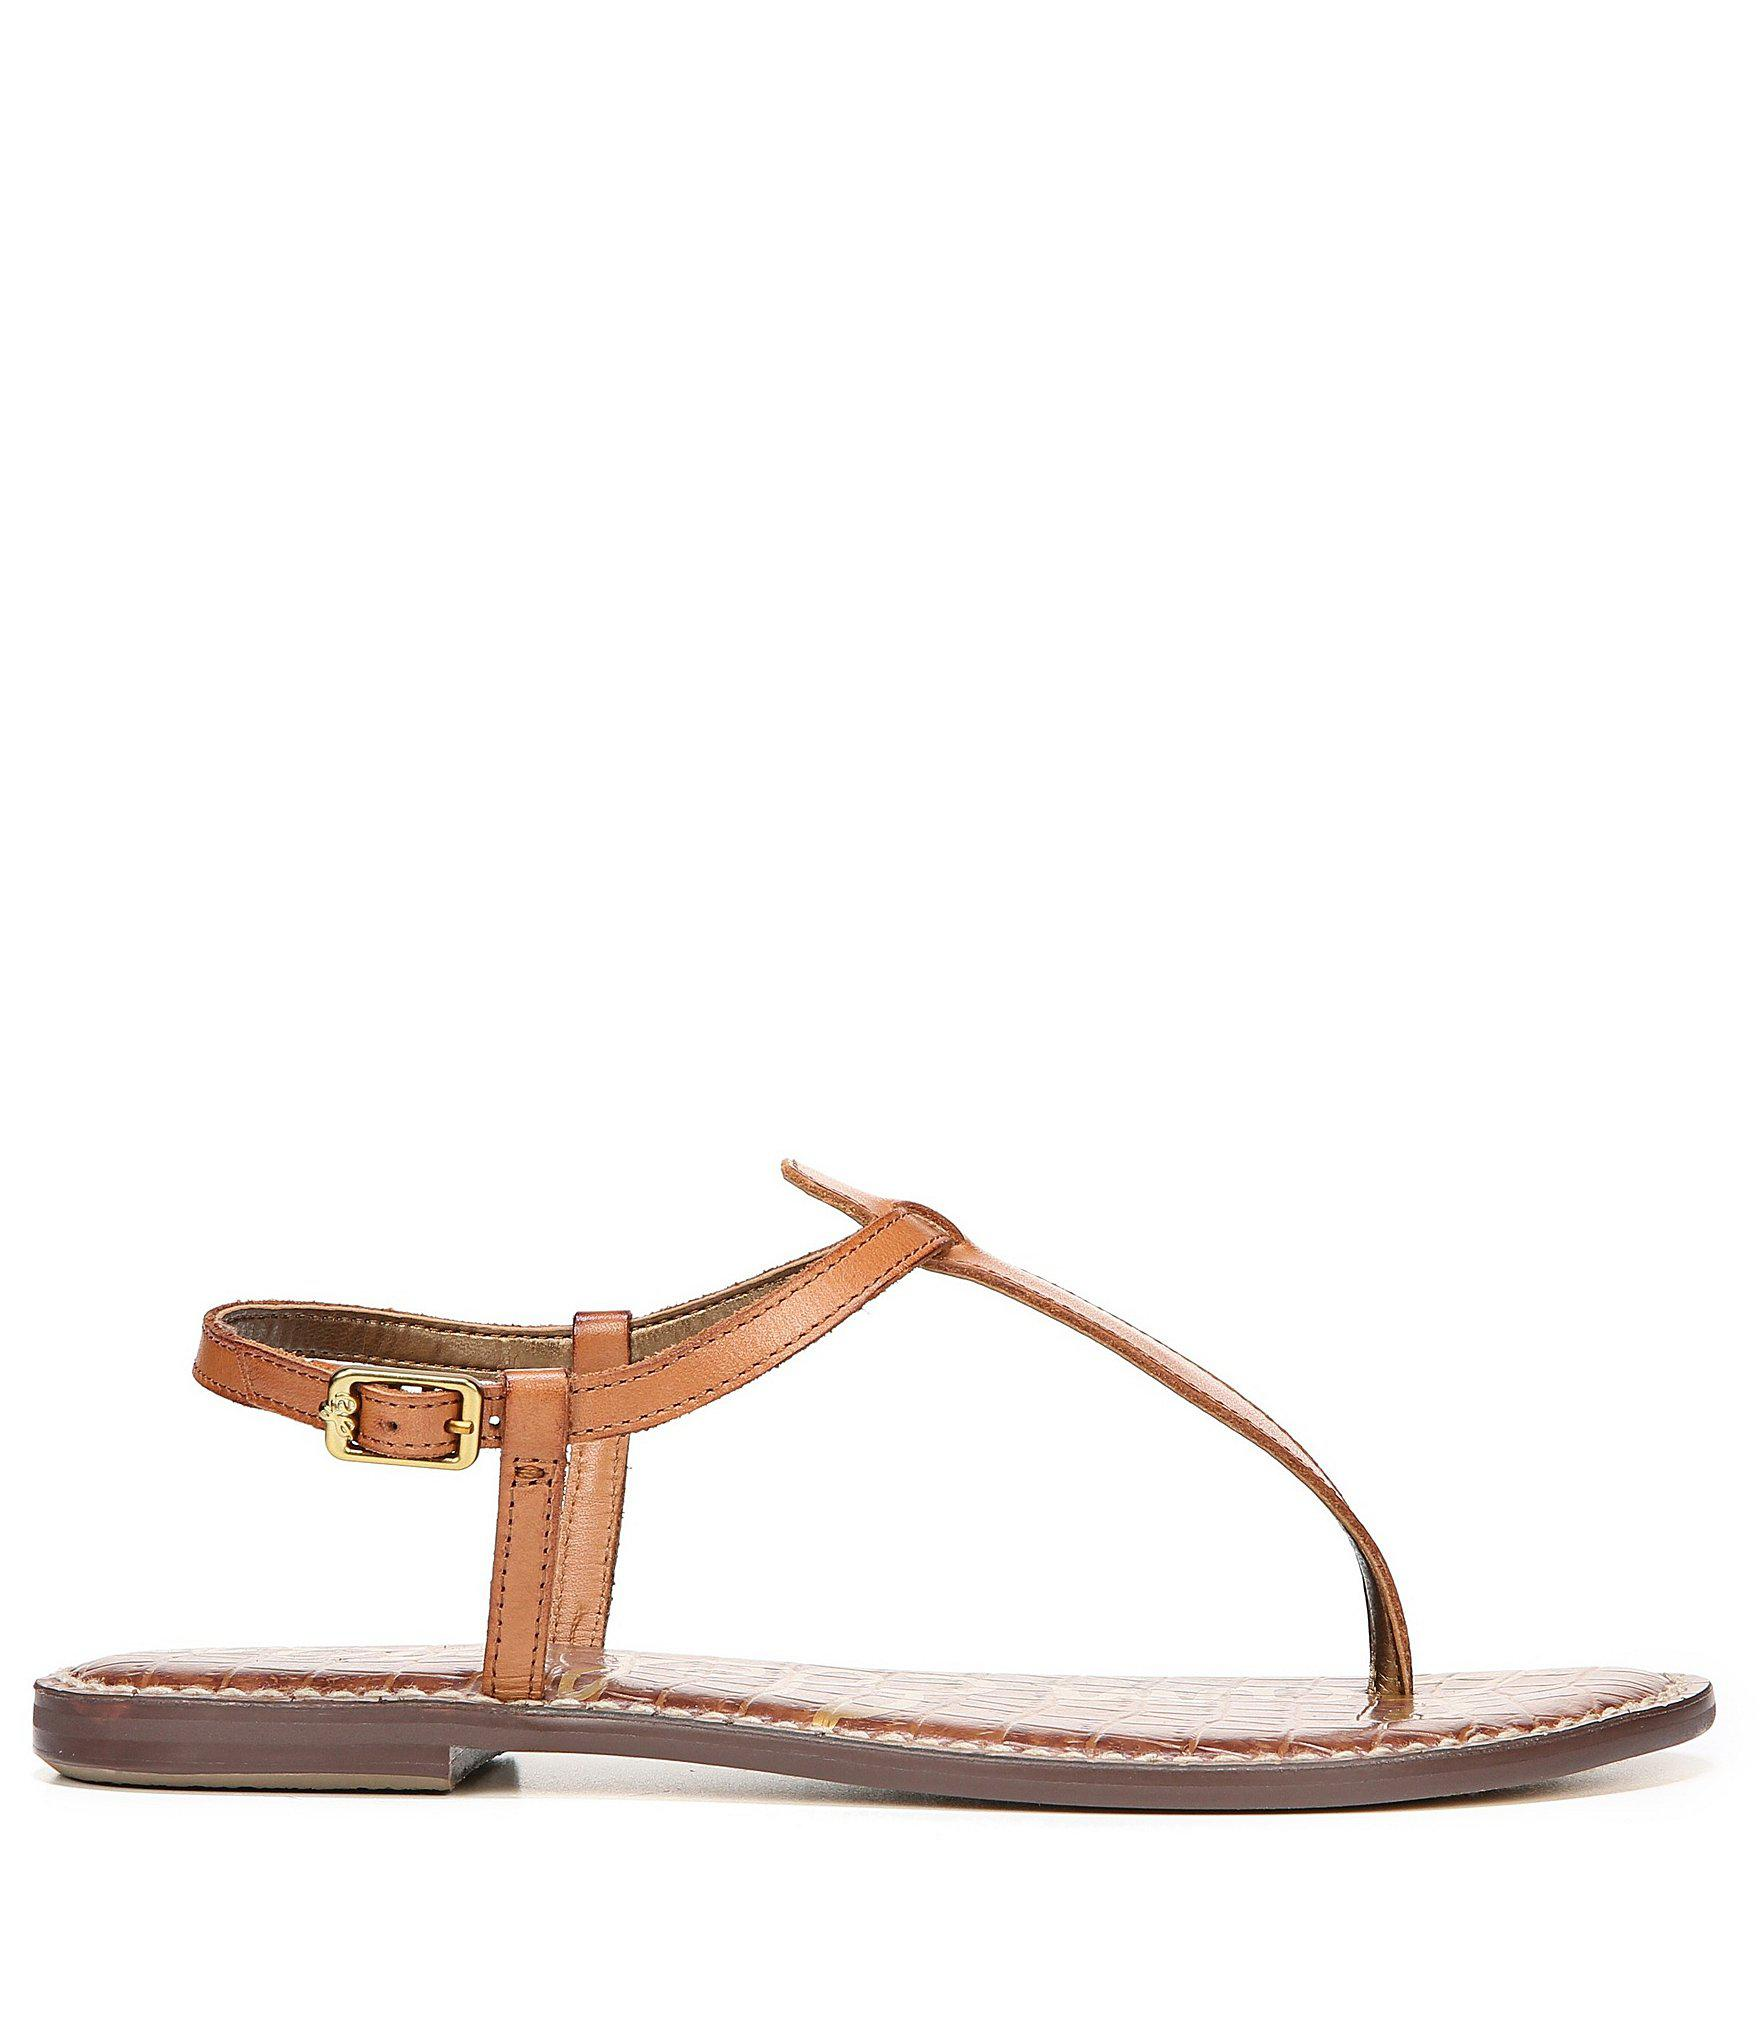 2e07a23c7 Sam Edelman - Brown Gigi T-strap Sandals - Lyst. View fullscreen